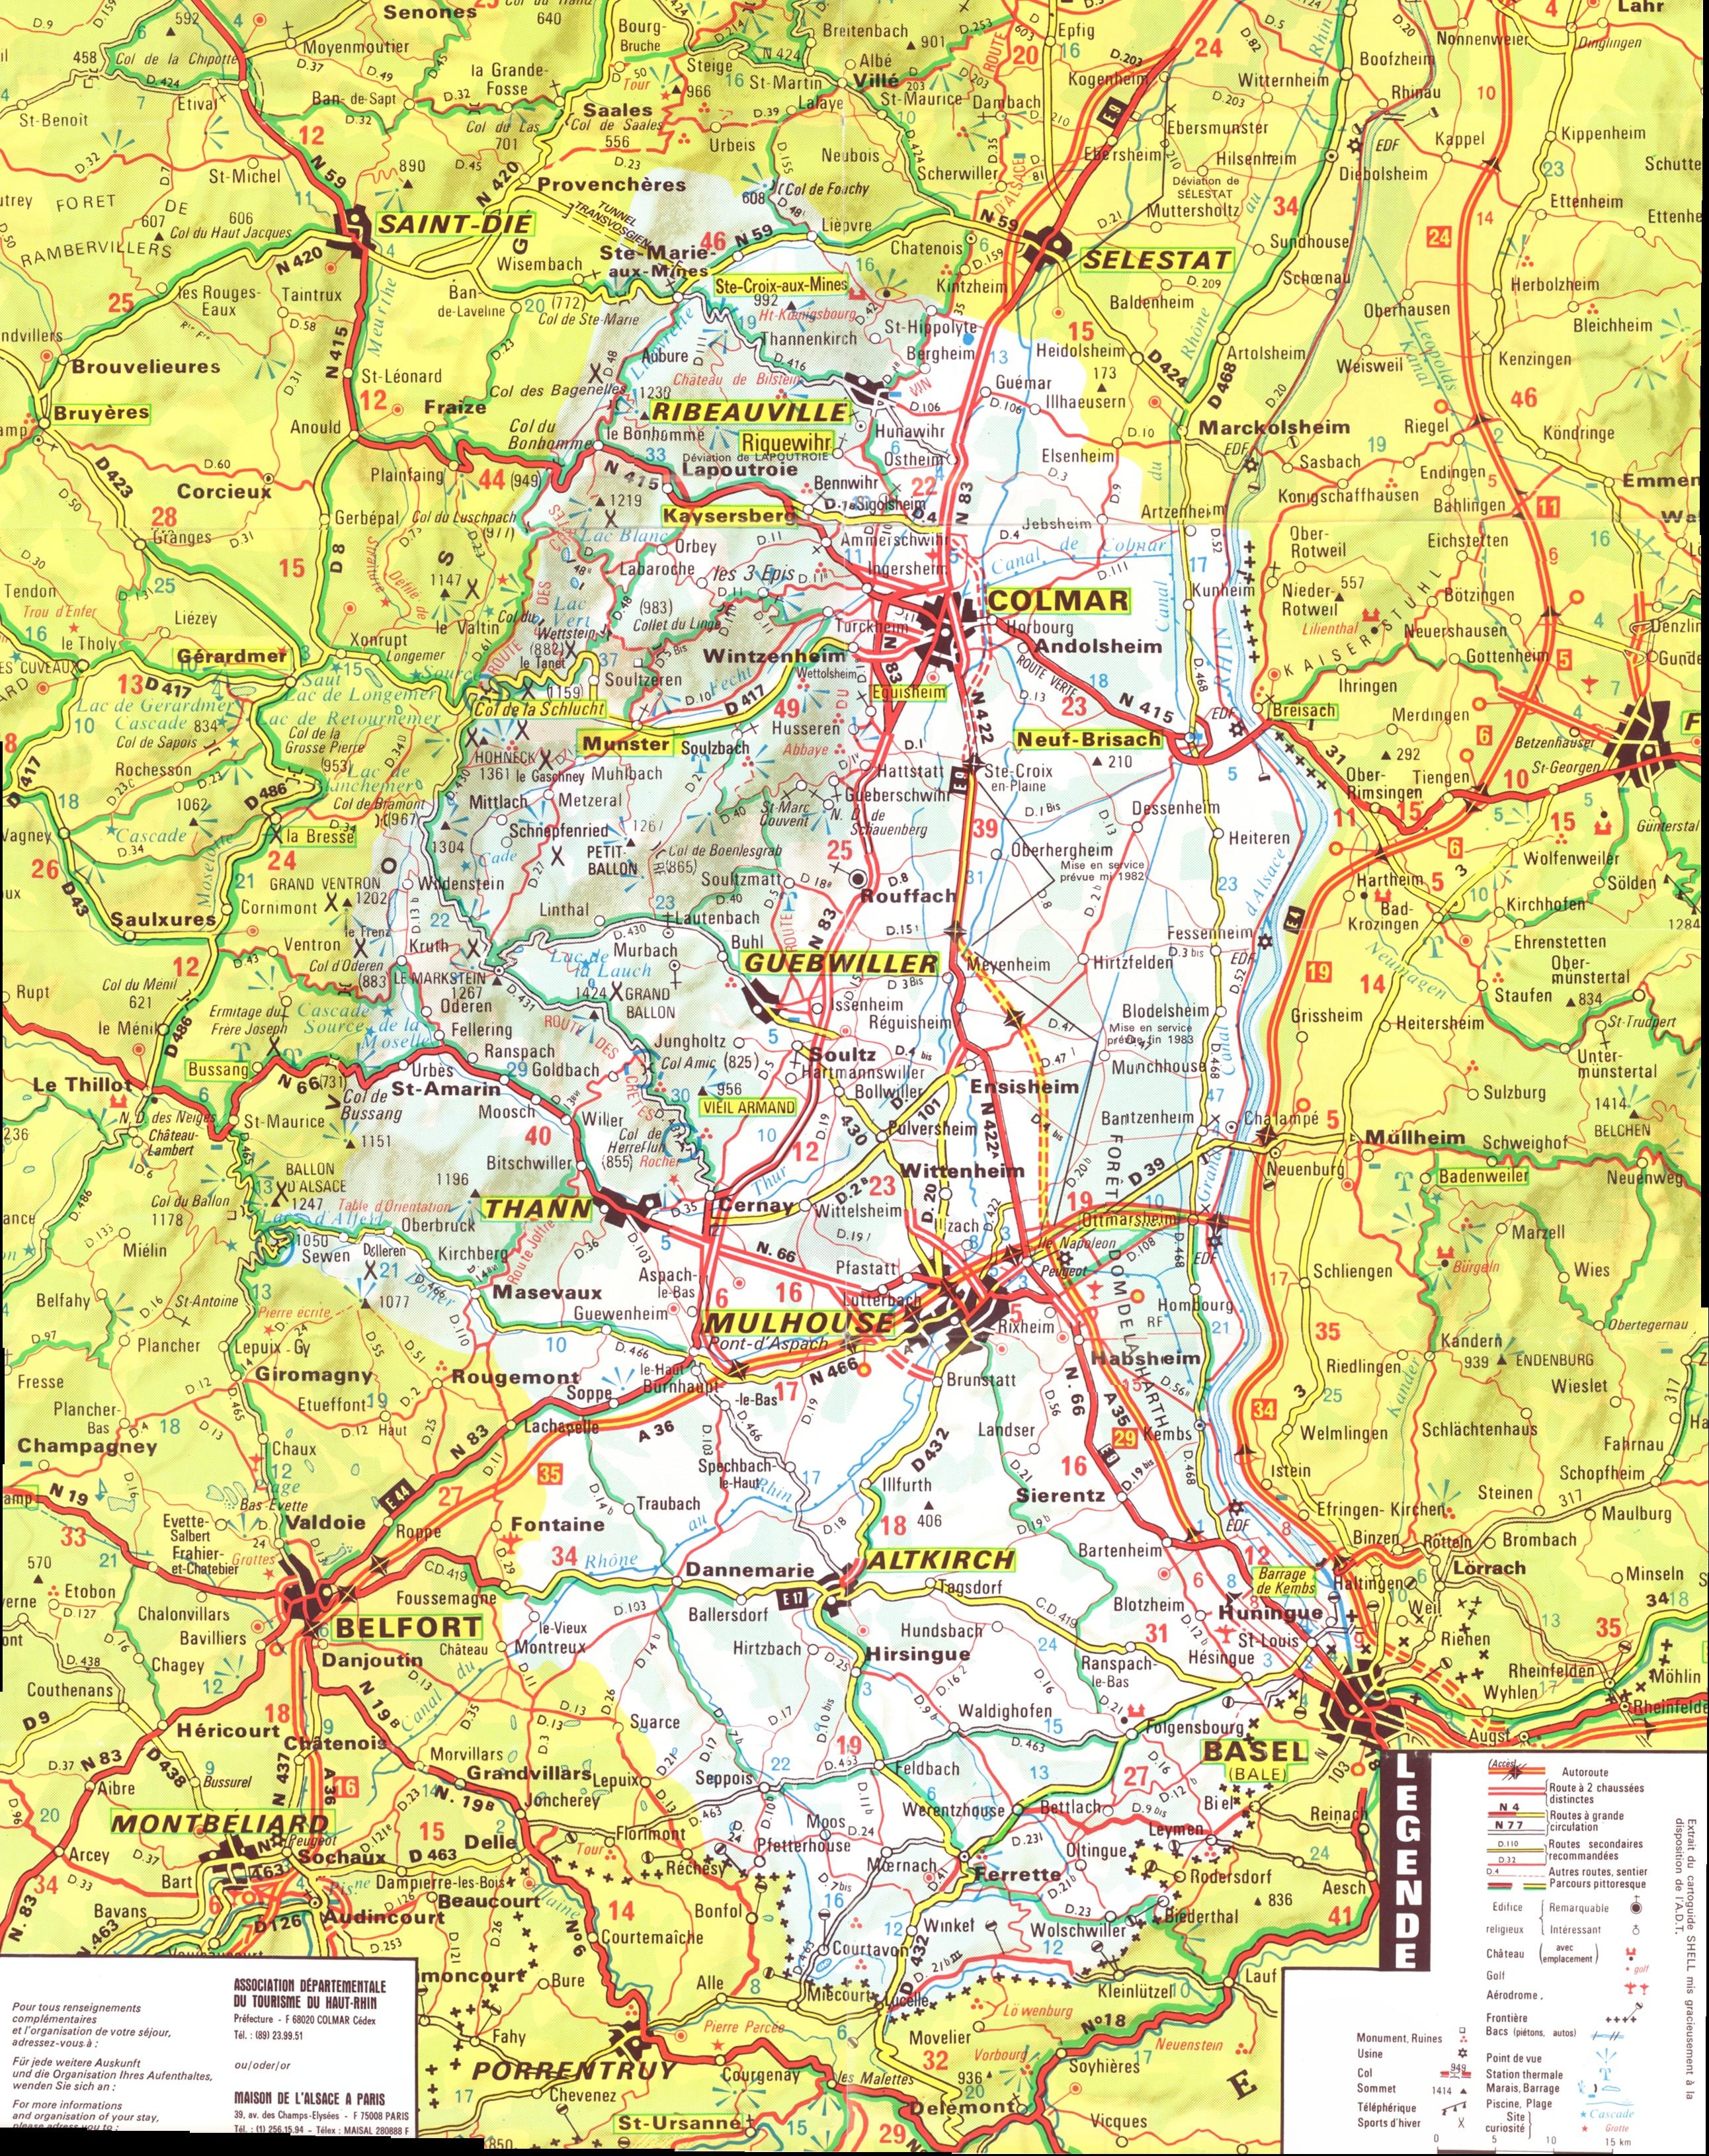 carte alsace haut rhin Alsace   Haut Rhin Map   alsace fr • mappery